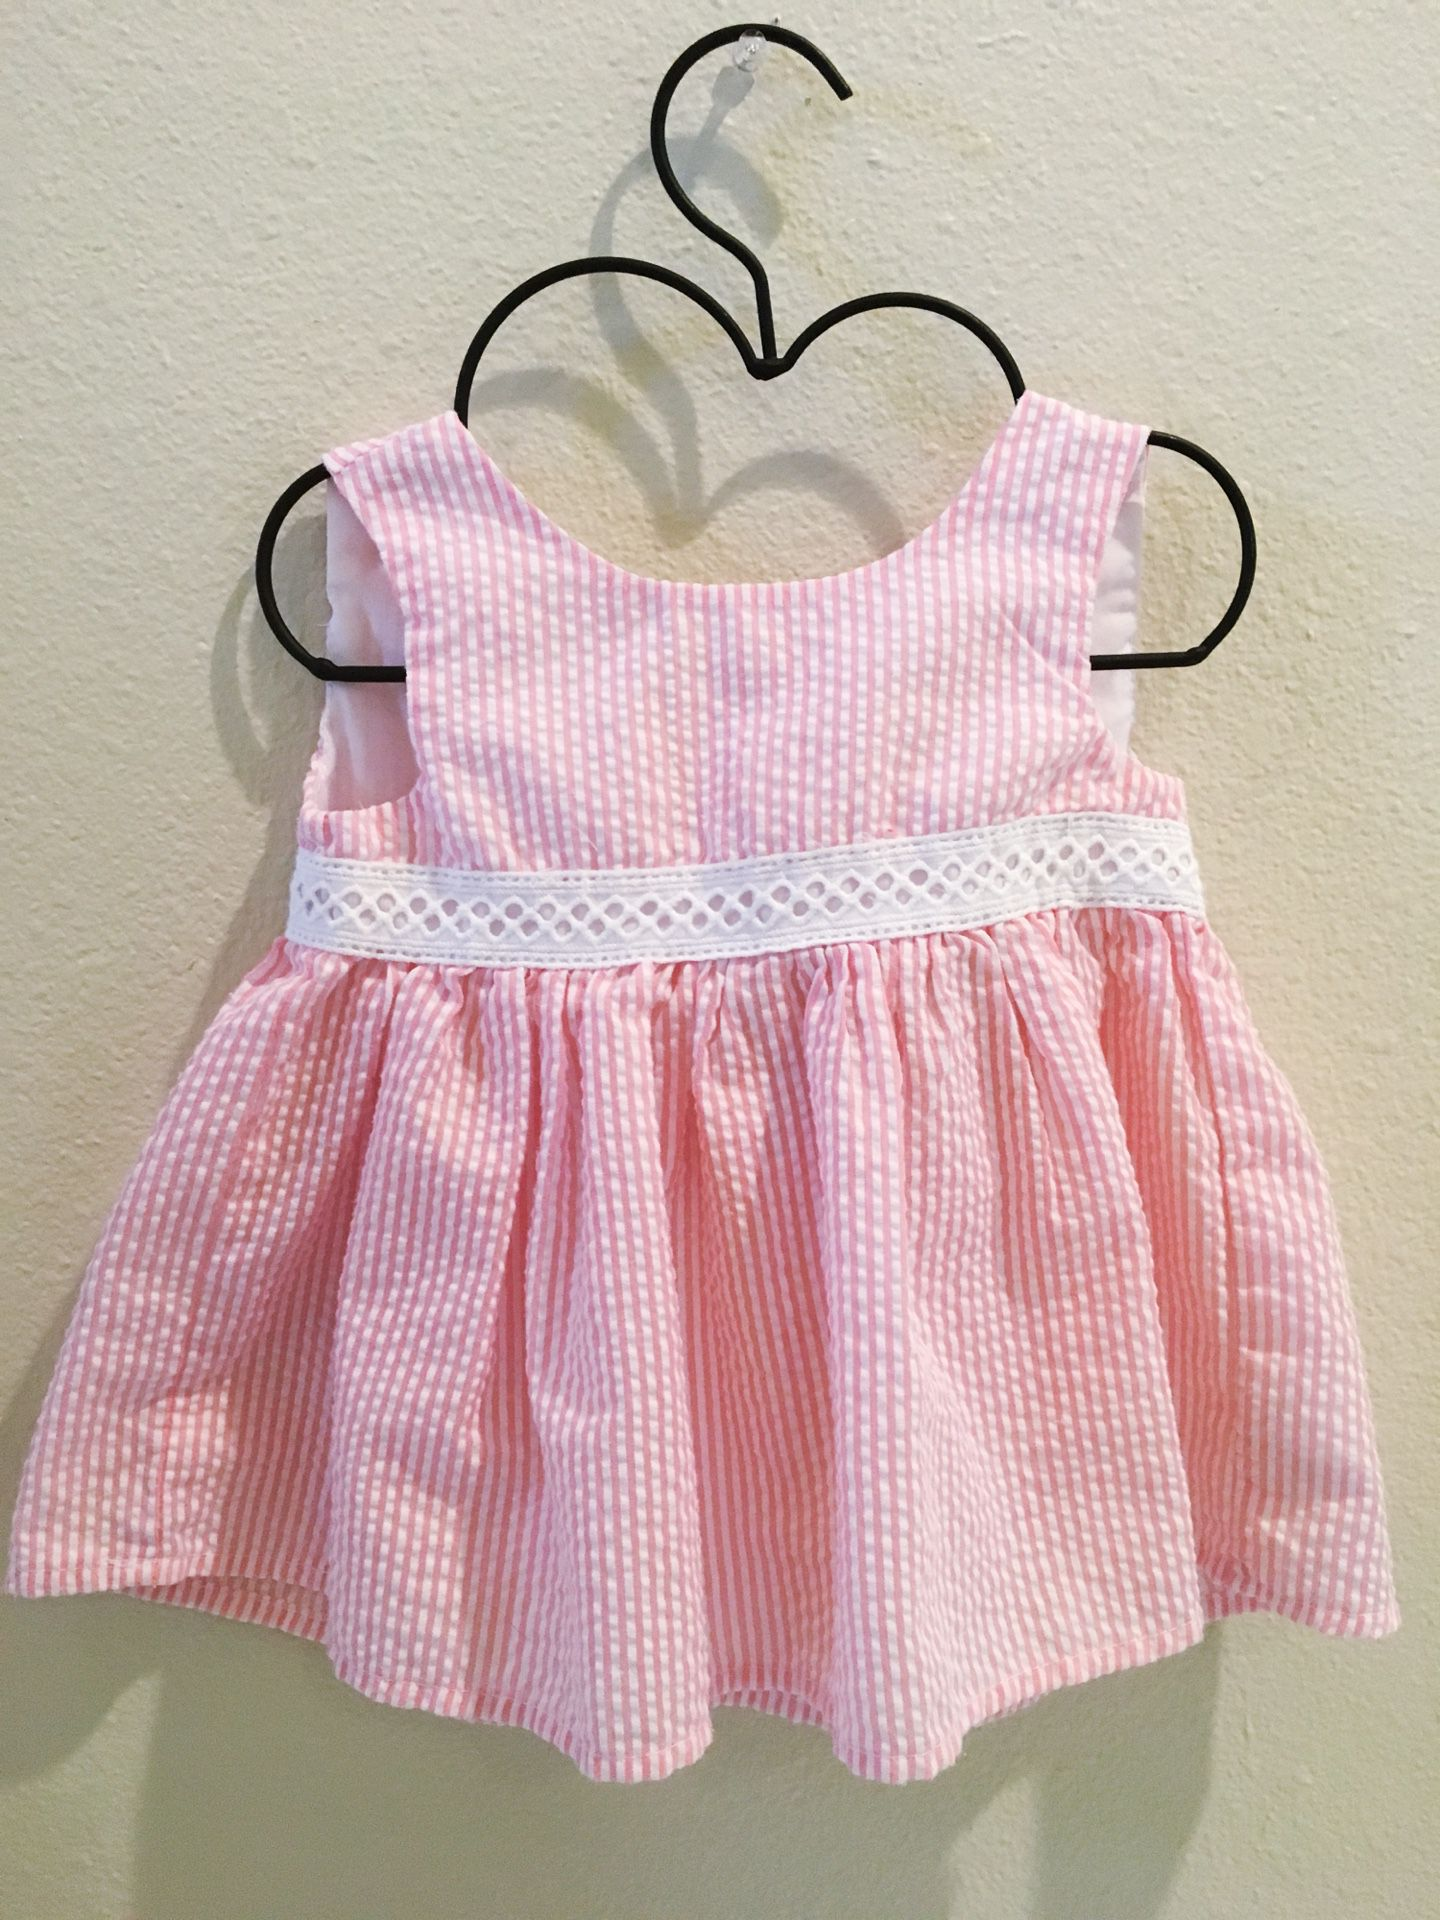 3-6mo baby girl dress